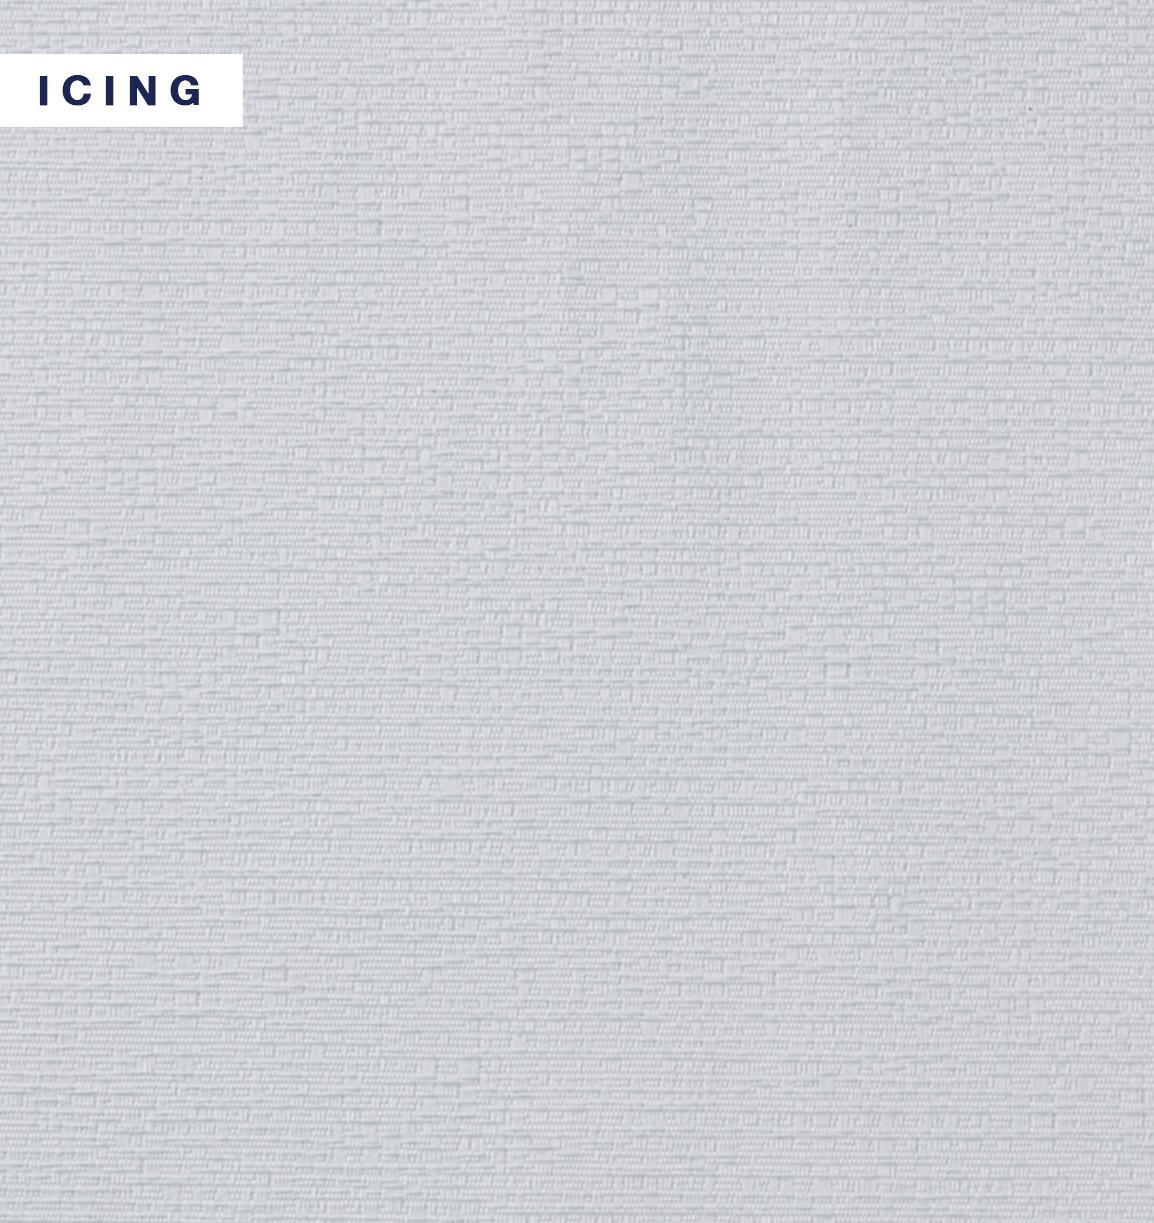 Linna - Icing.jpg